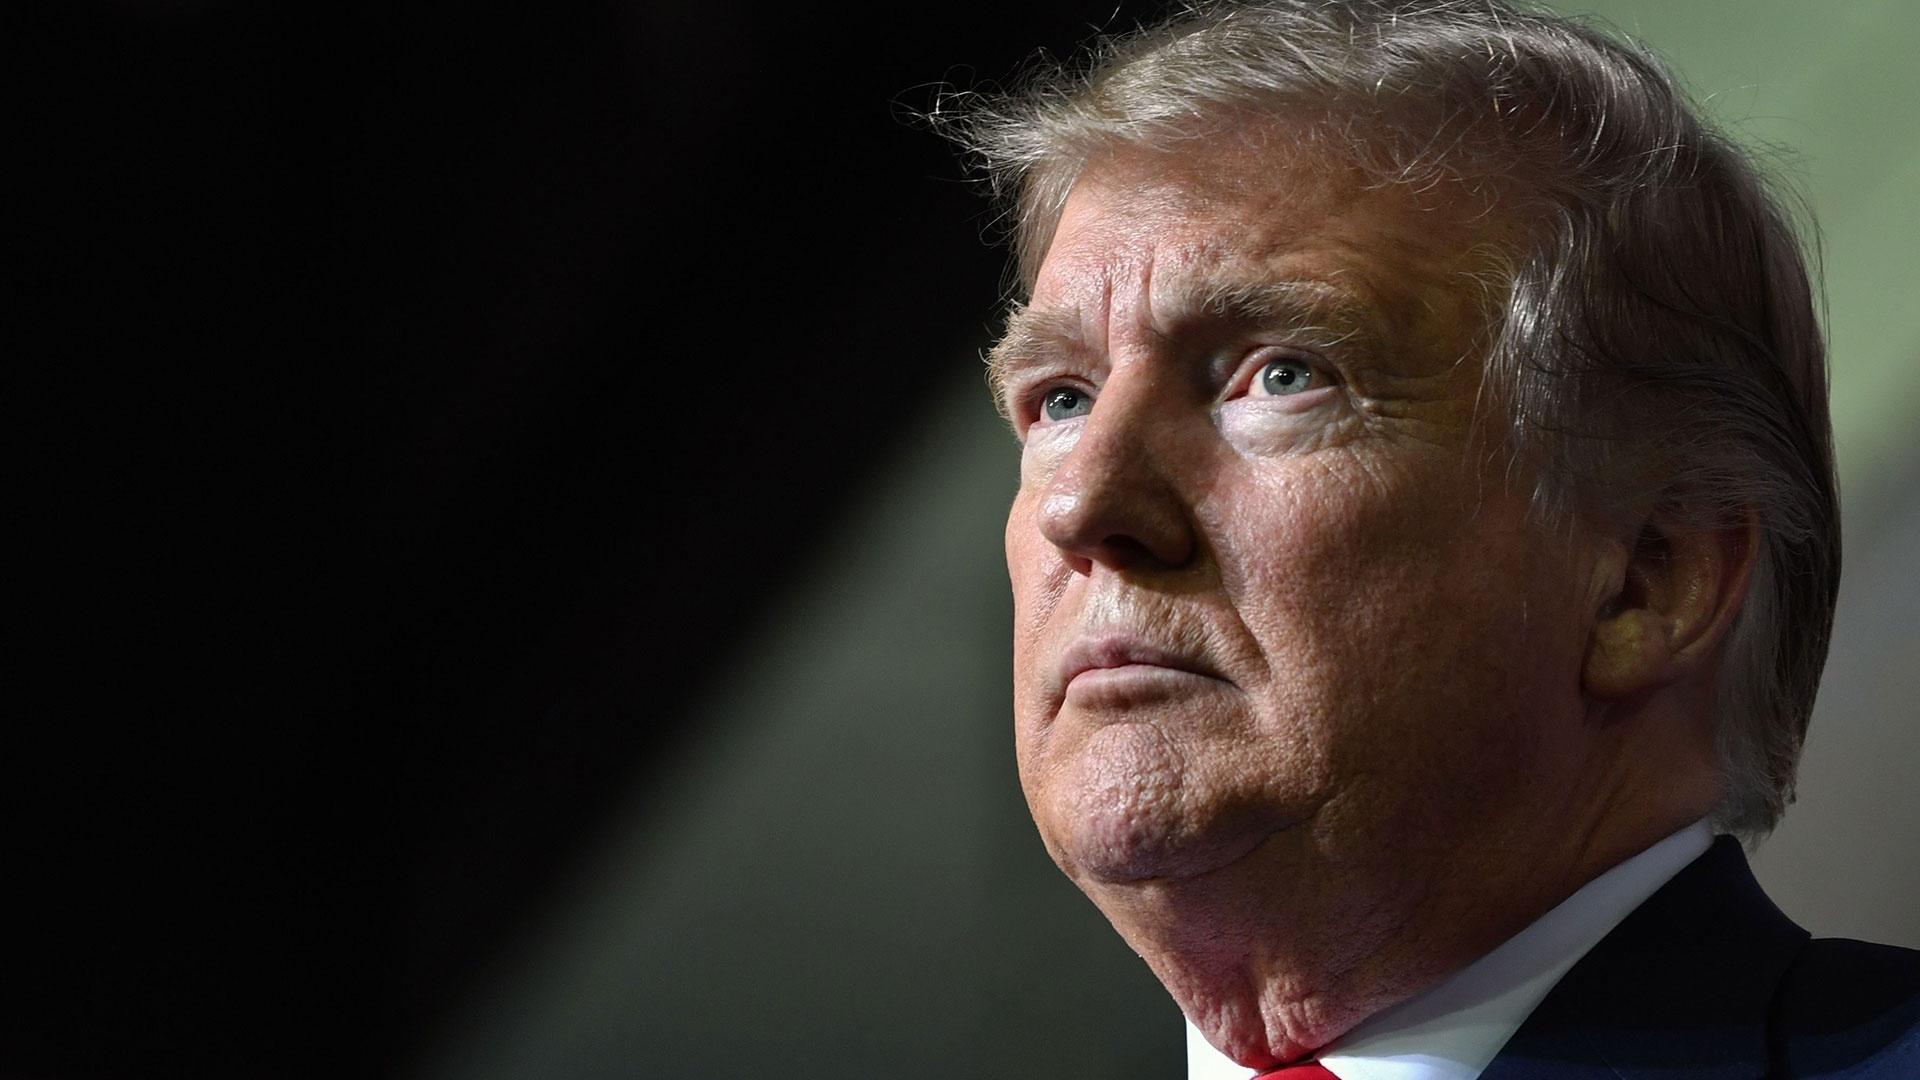 The Trump Impeachment Trial - Day 11